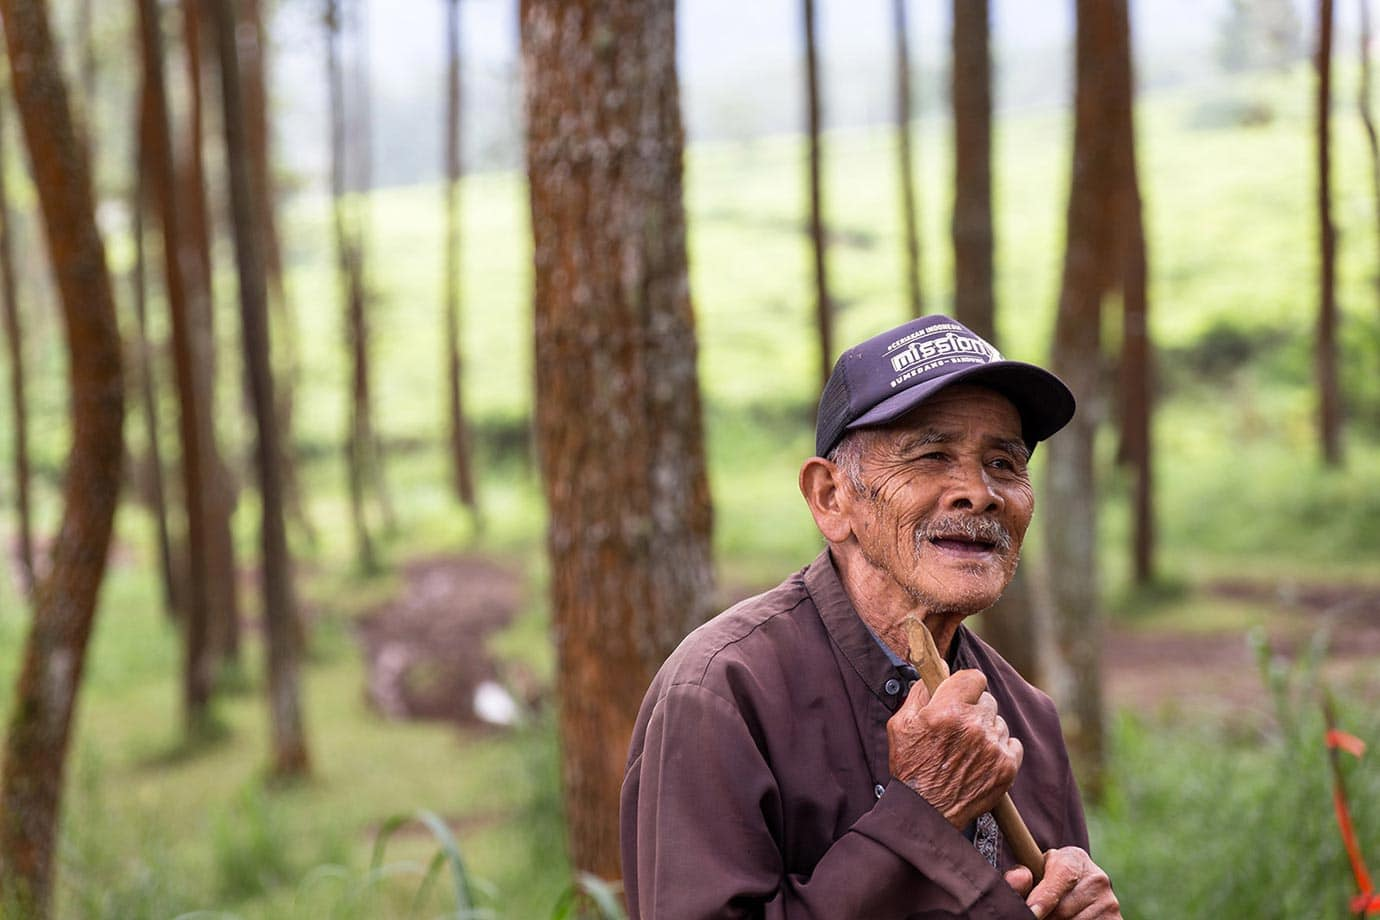 Man smiling in Bandung, Indonesia